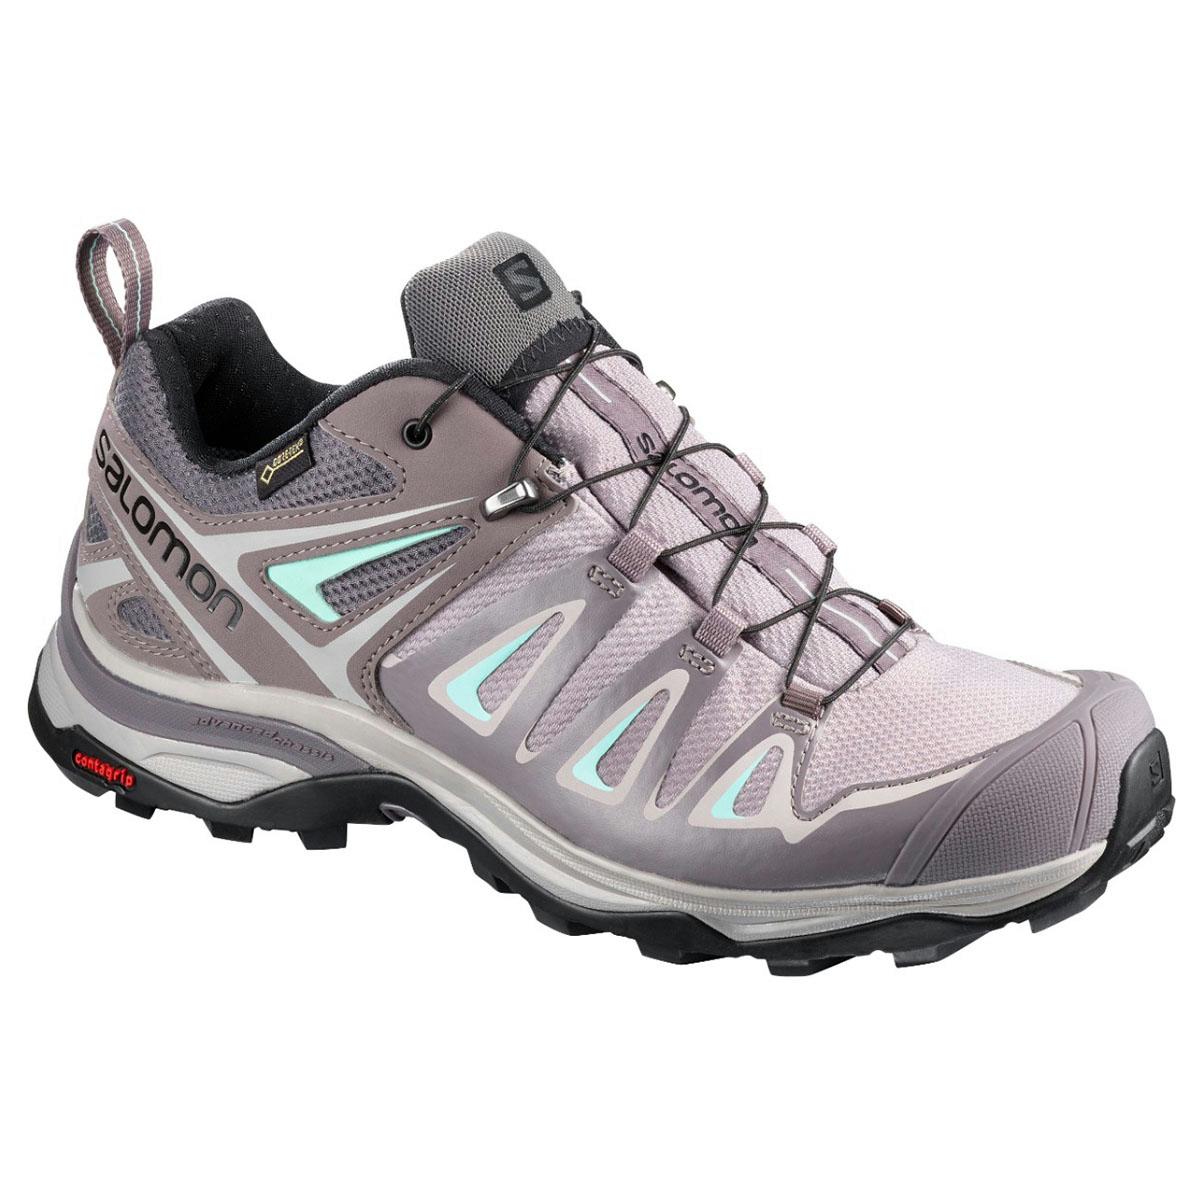 Salomon Gin 4 GTX W Ladies Trail Shoes Size: selectable New